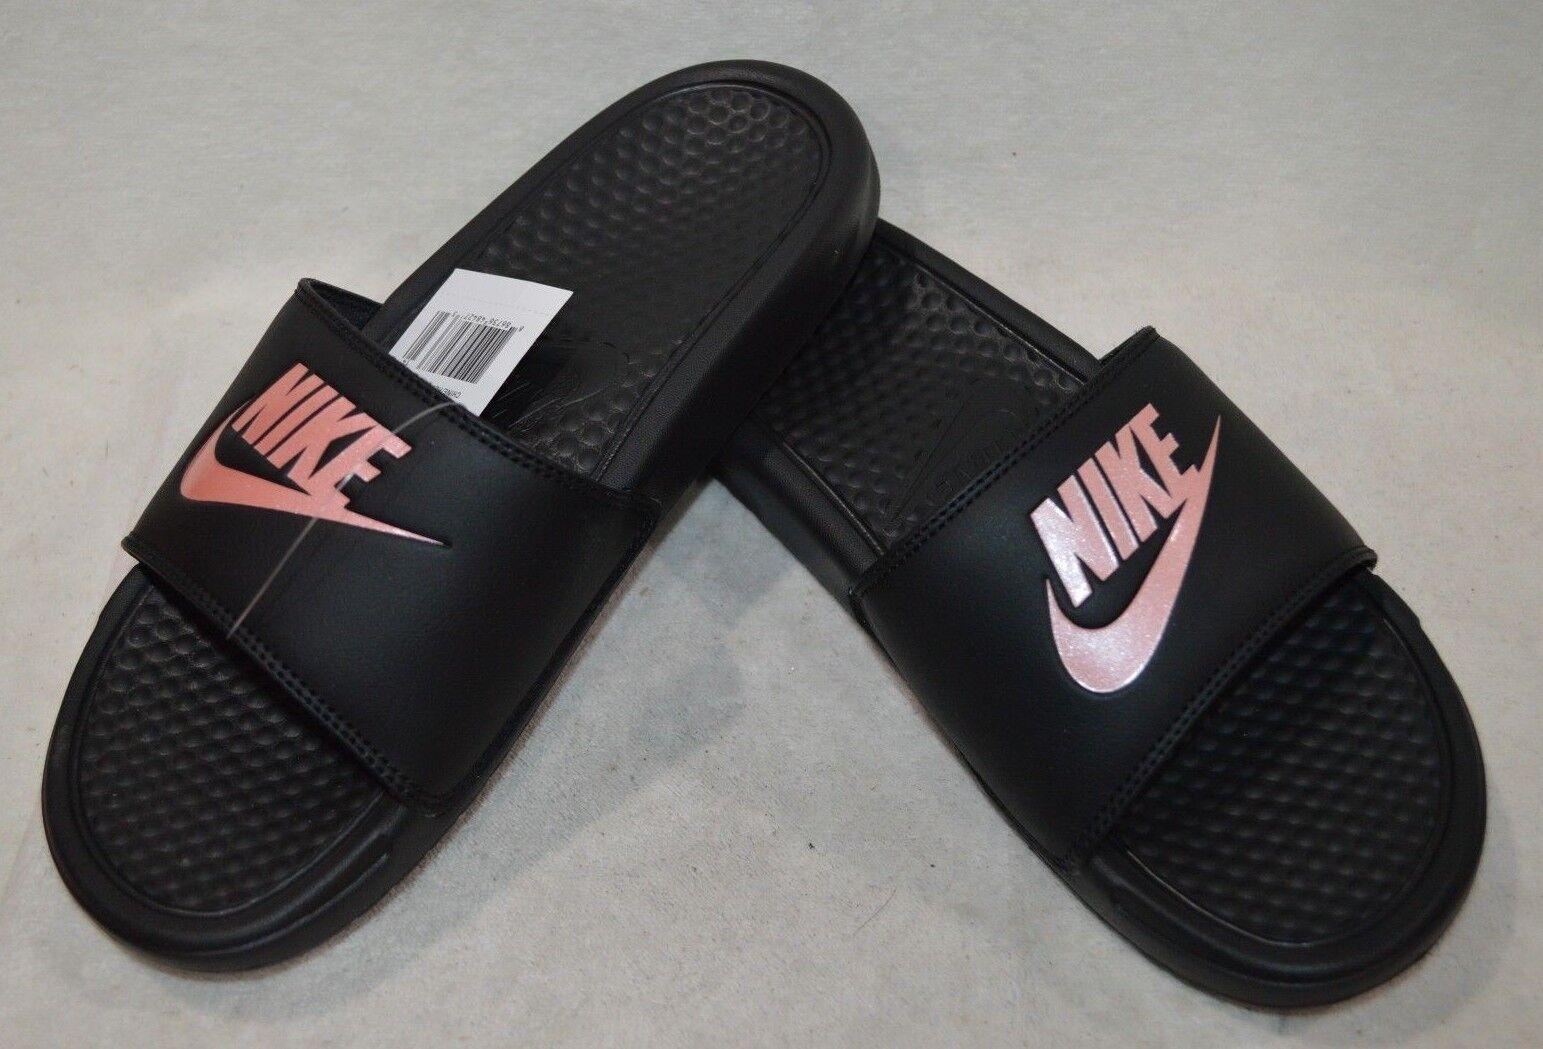 Nike Benassi - JDI Black/Rose Gold Women's Slides Sandals - Benassi Size 6/7/8/9/10/11 NWB 6dd2ba